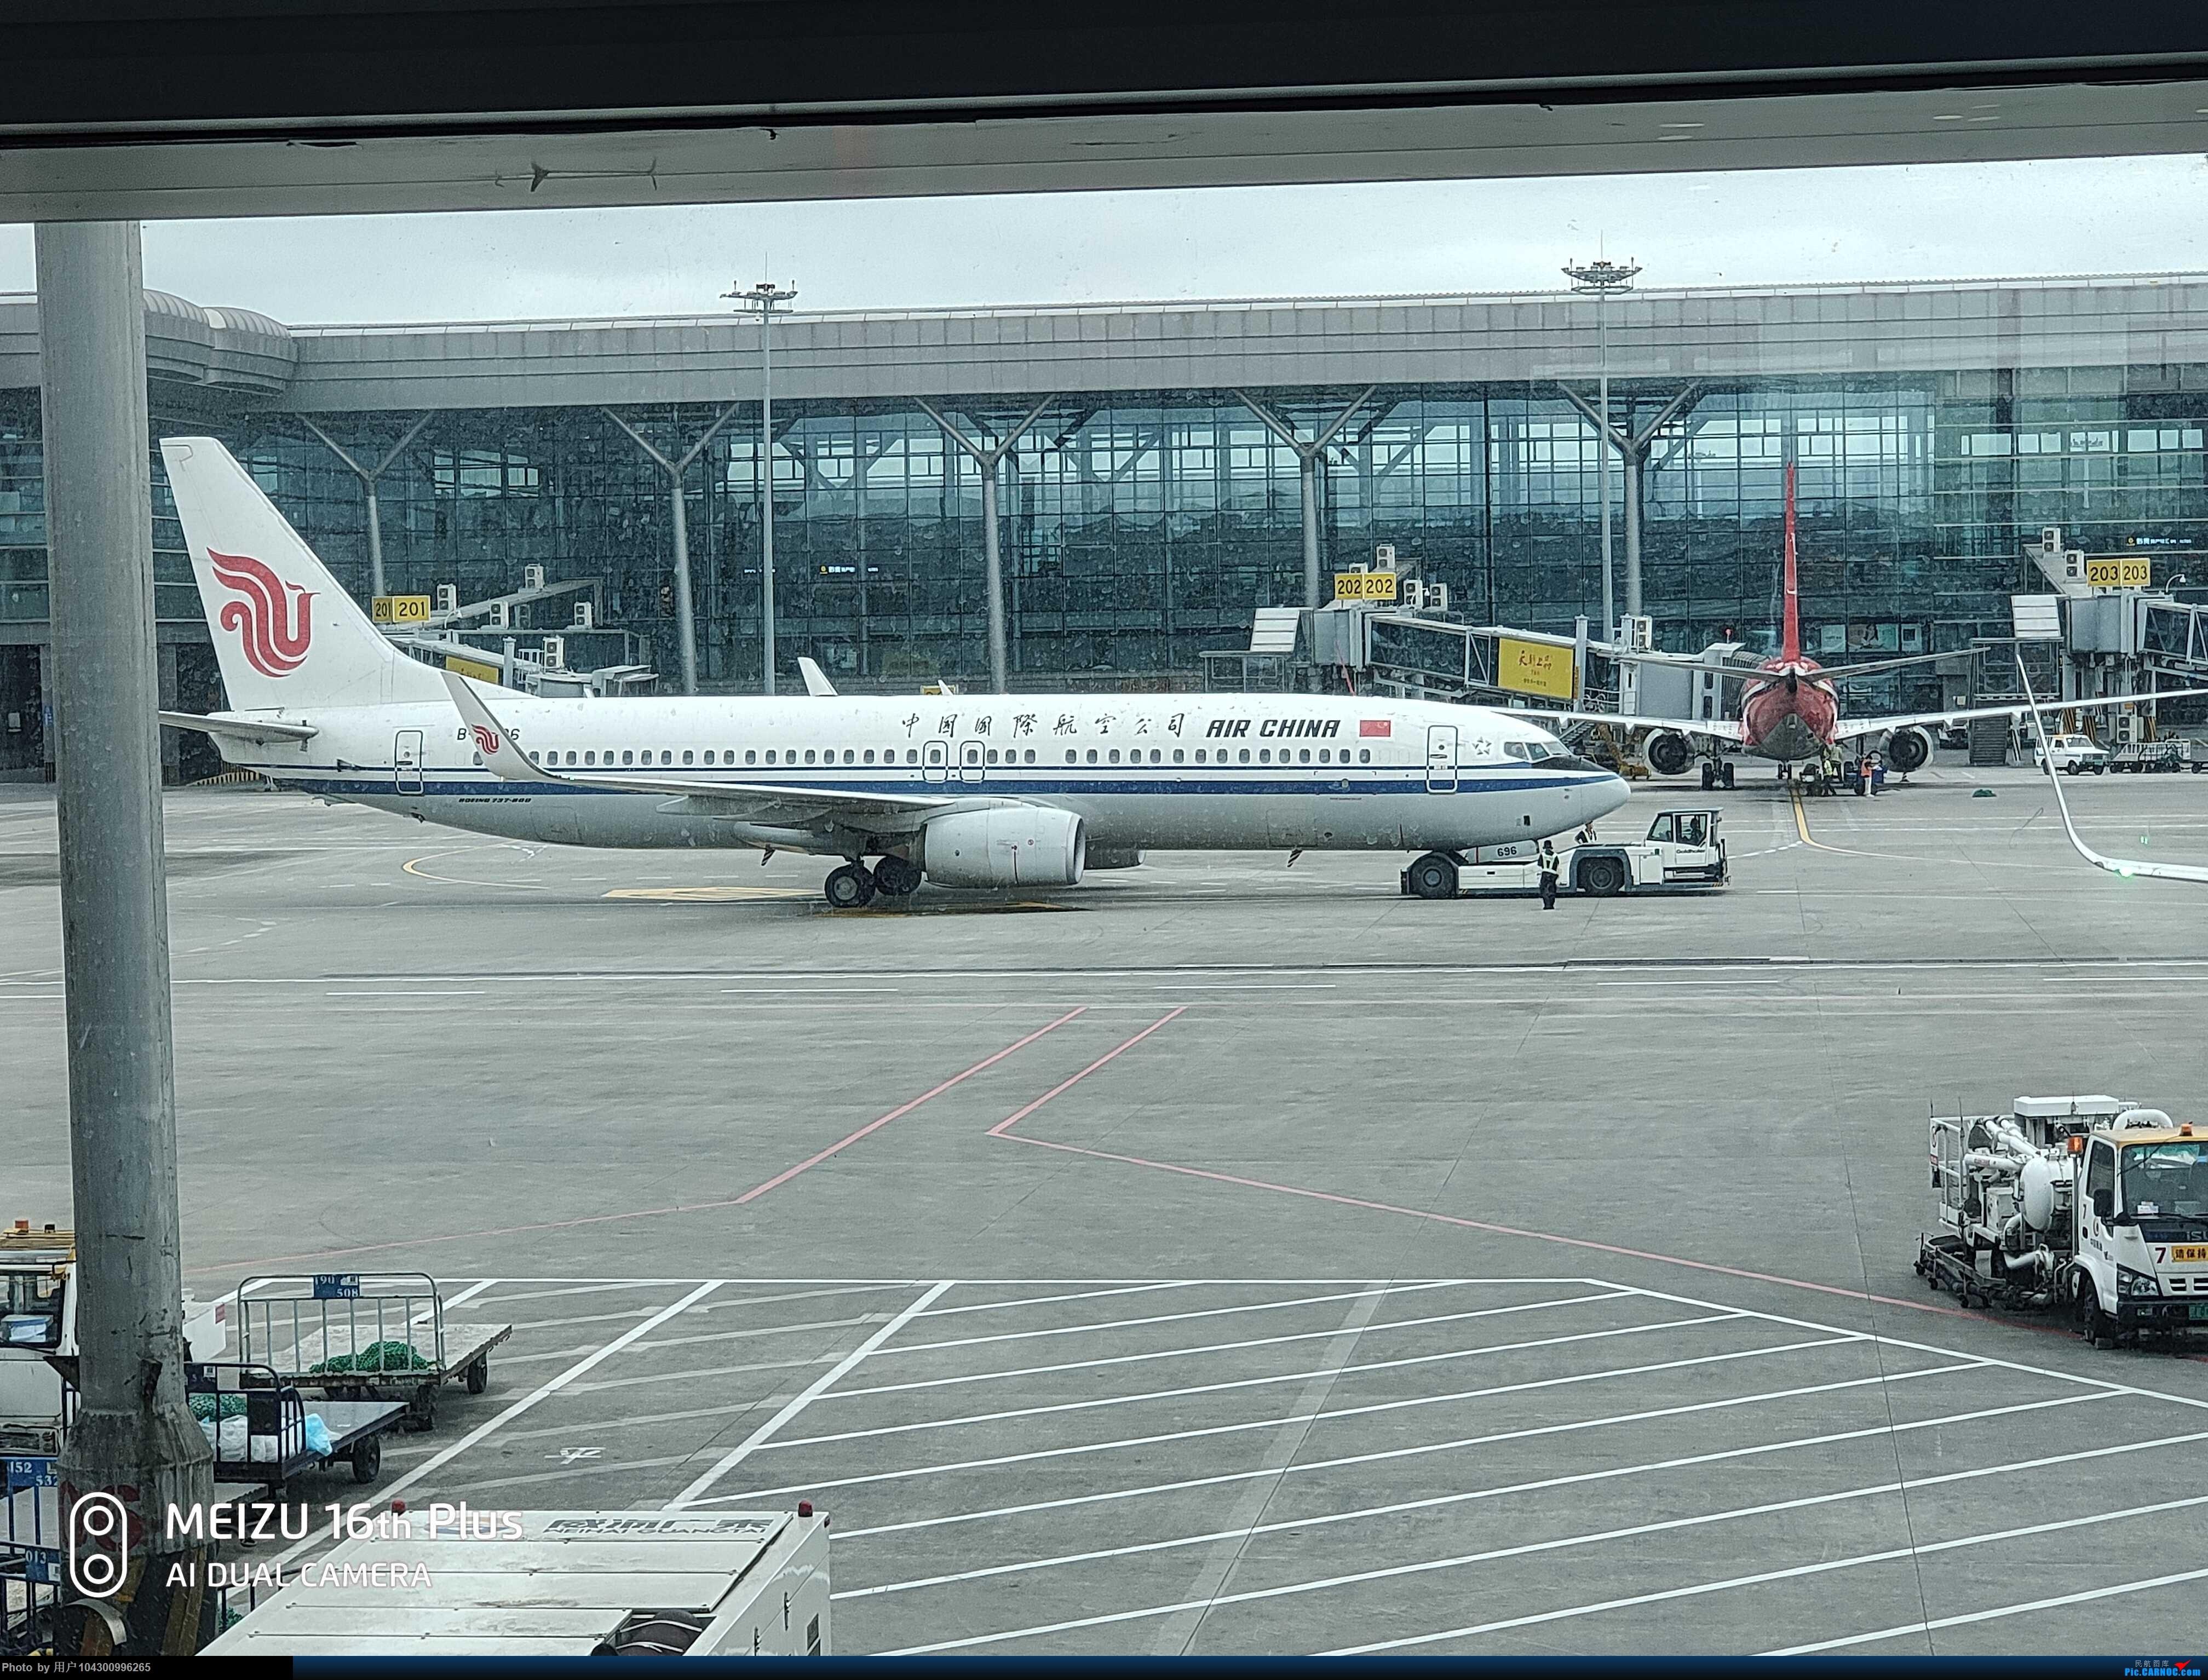 Re:[原创][DM哥飞行游记]-多彩贵州航空贵阳-茅台当日往返 BOEING 737-800 B-5696 中国贵阳龙洞堡国际机场